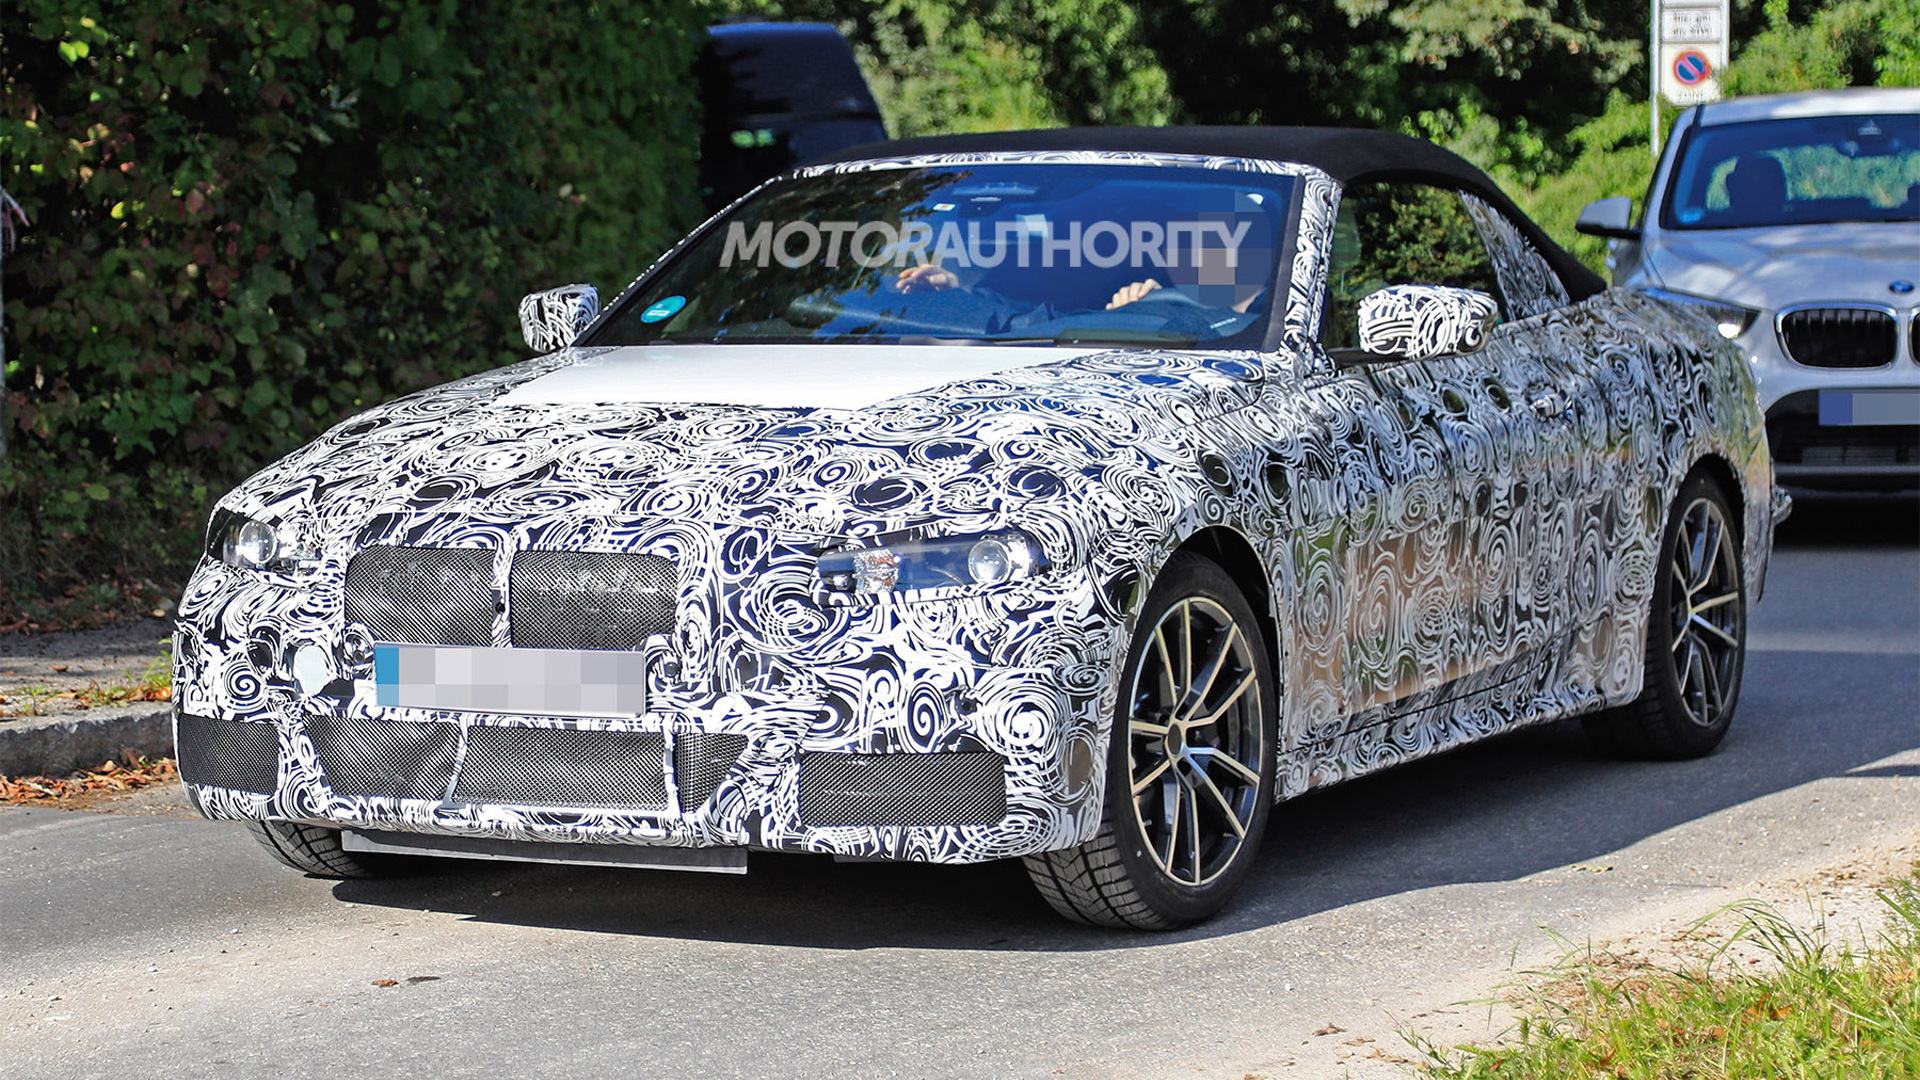 2021 BMW 4-Series Convertible spy shots - Image via S. Baldauf/SB-Medien